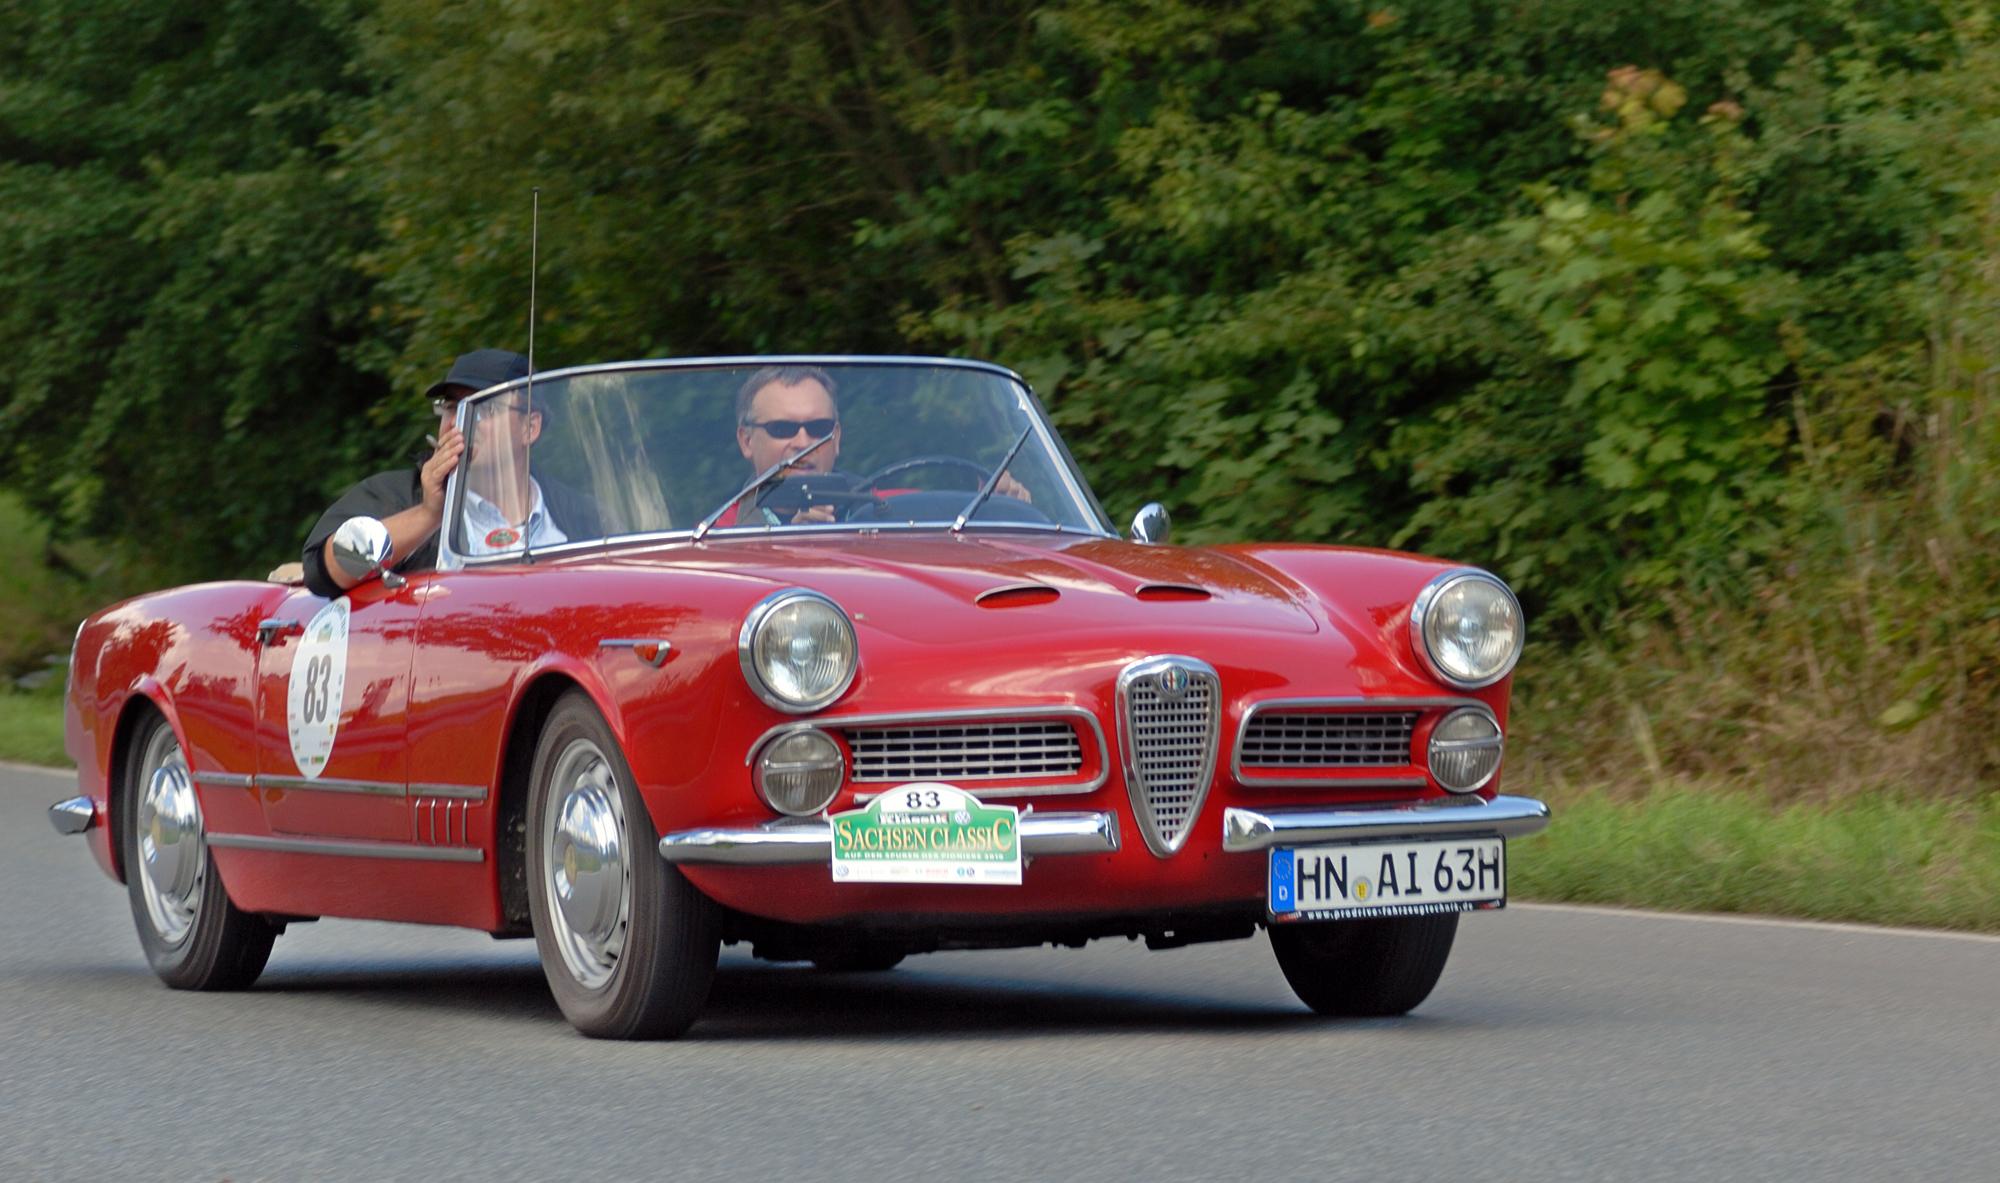 1991 Alfa Romeo Spider besides Custom 2nd Gen Dodge Cummins B6b7f1f51816e210 moreover 2013 Xts in addition 1961 Alfa Romeo Spider Normale 101 also 2012 R8 gt spyder. on 1991 alfa romeo spider for sale